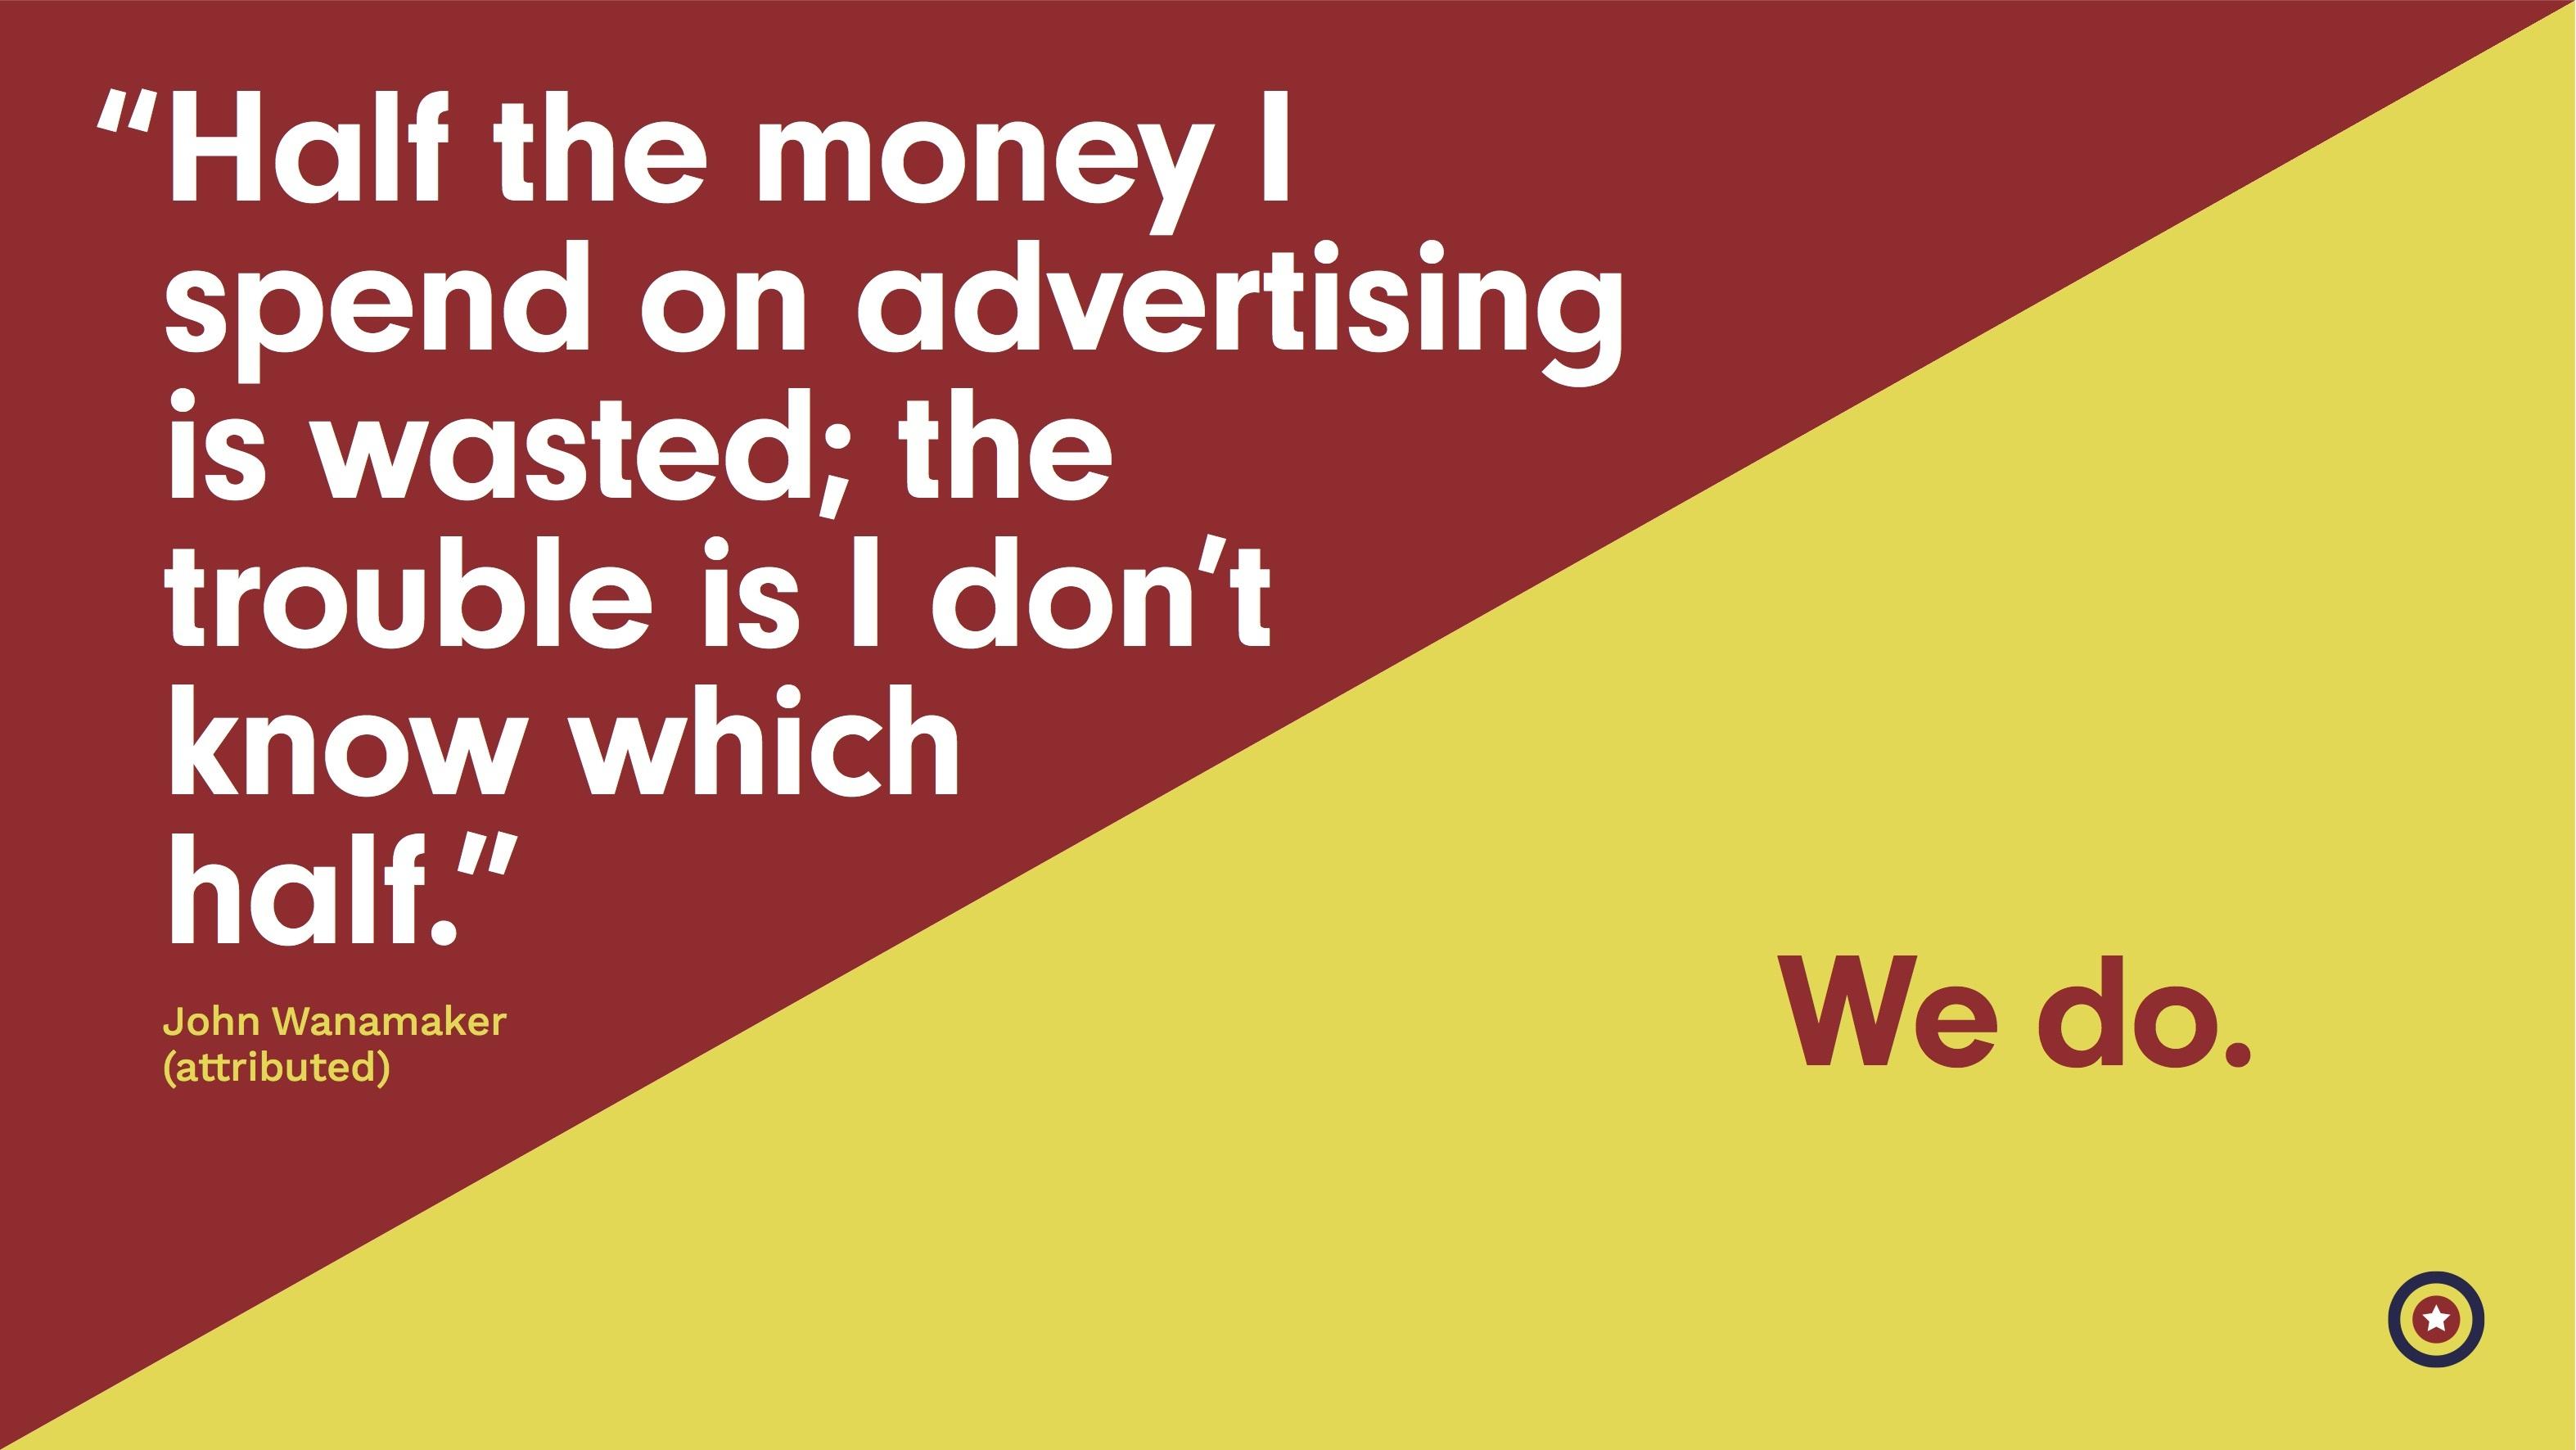 20171107_advertise11.jpg#asset:587902